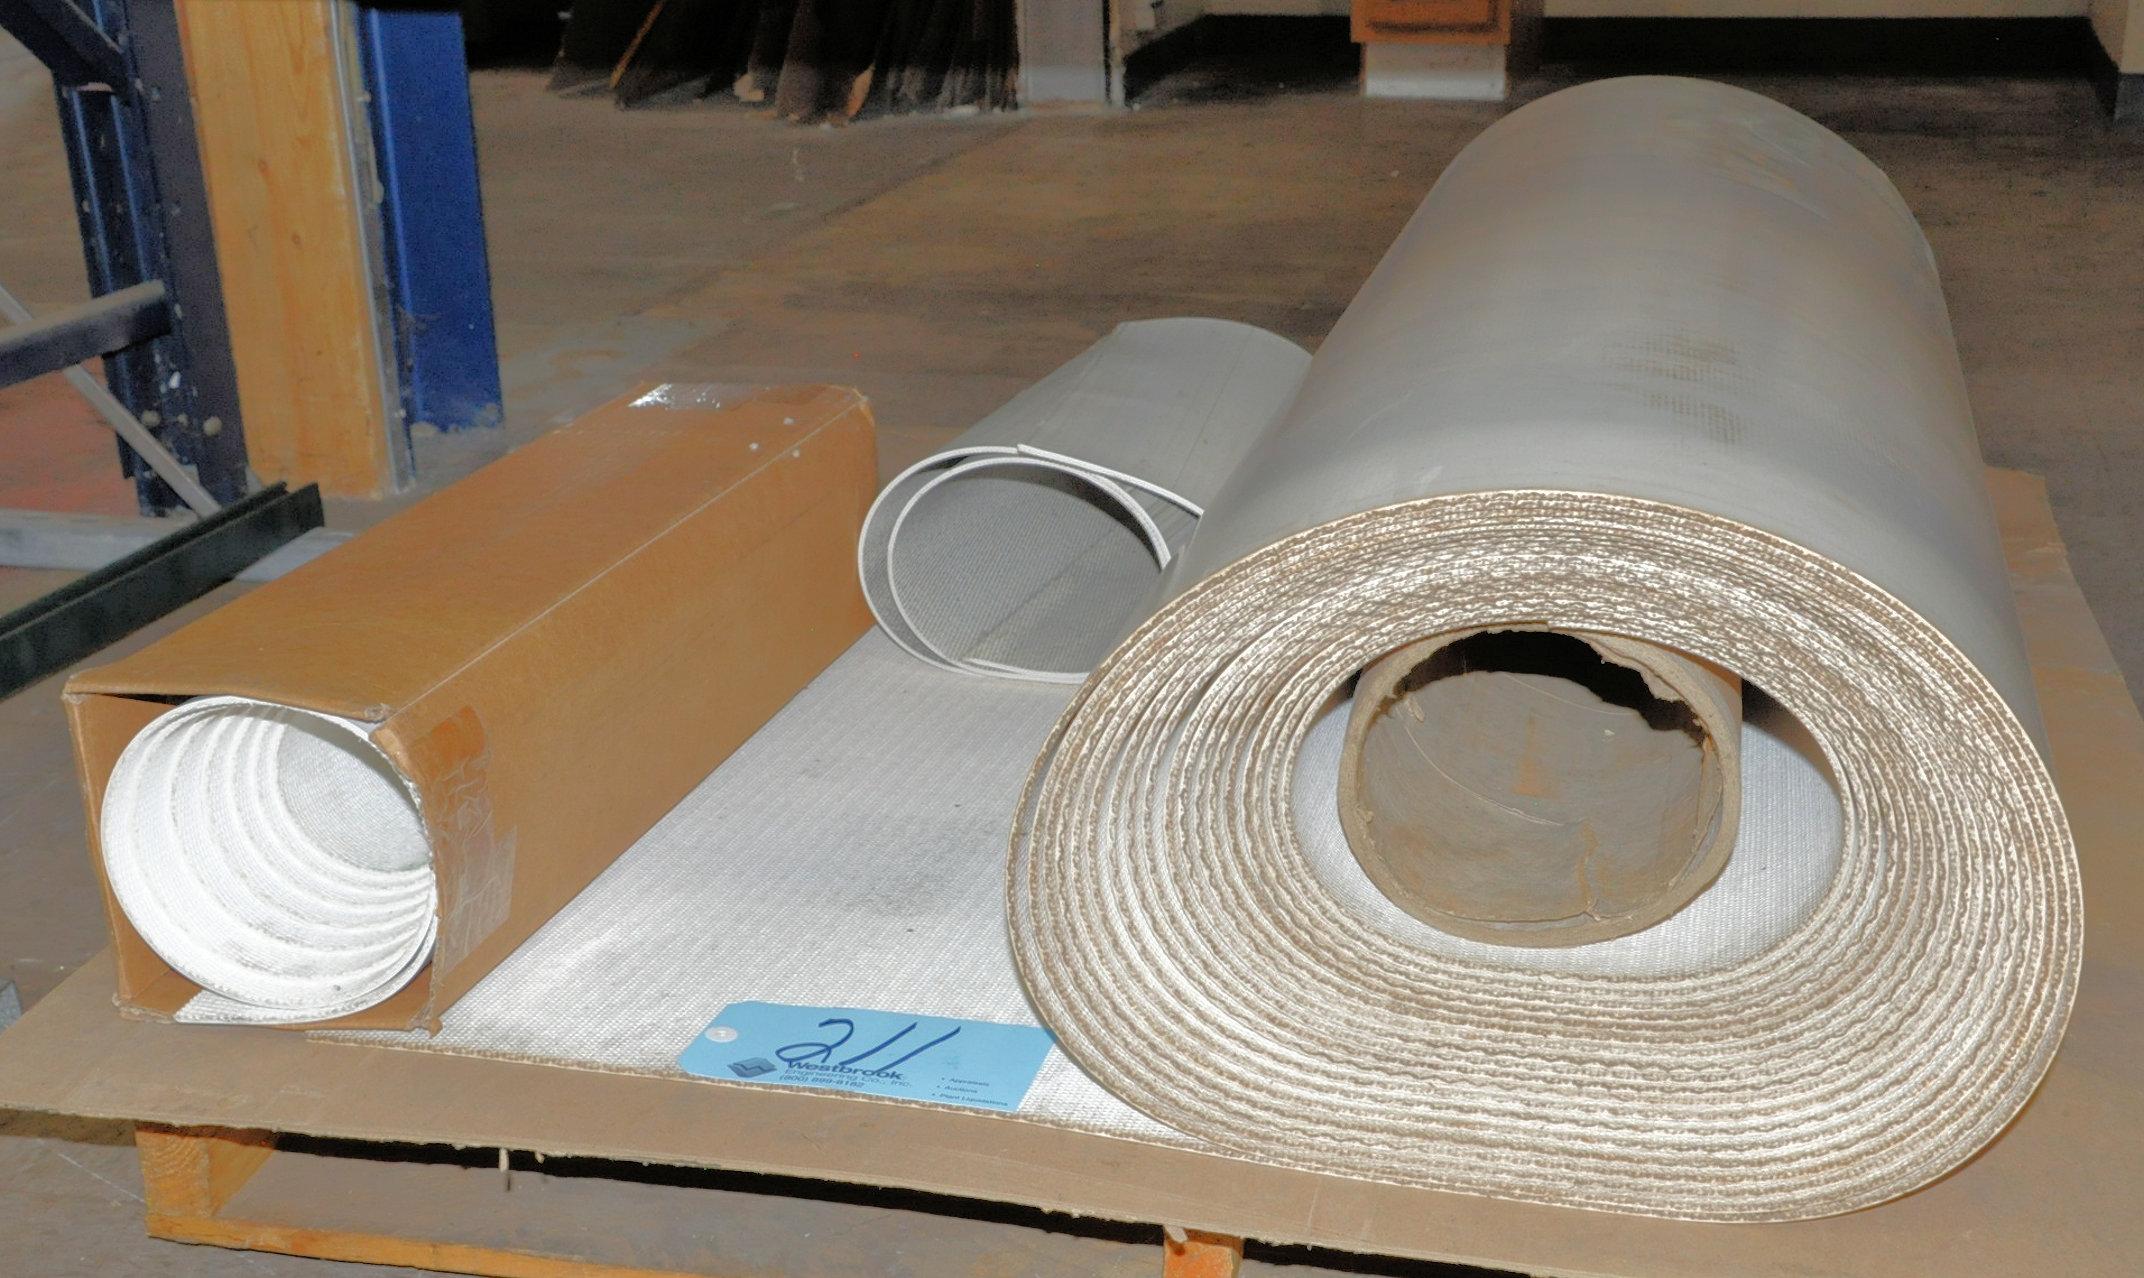 Lot 211 - Lot-Conveyor Belt Materials on (1) Pallet